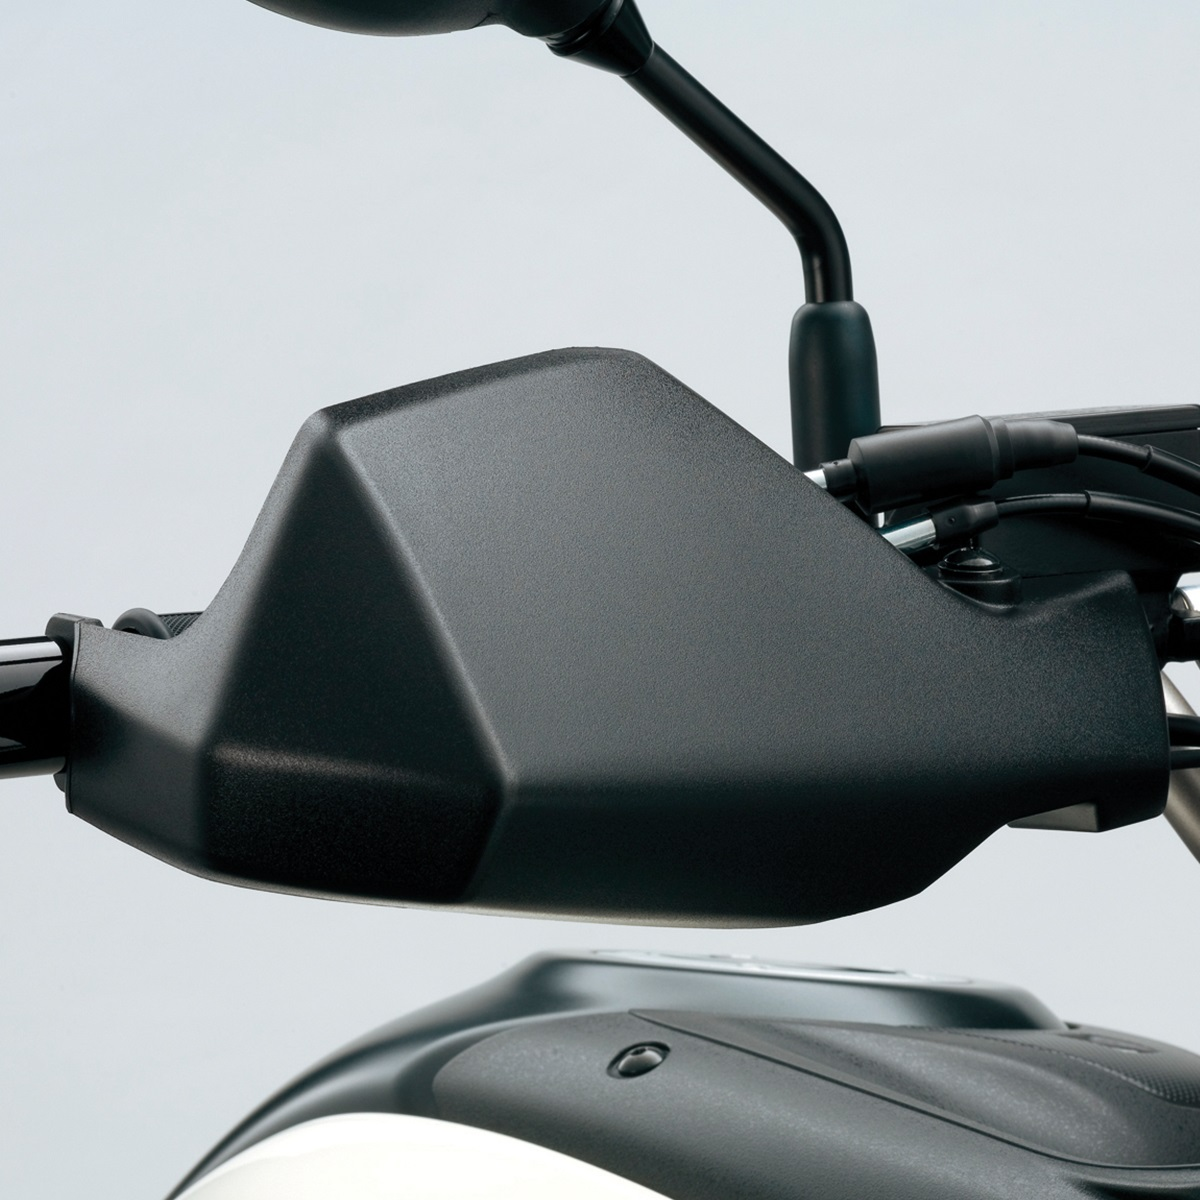 V-Strom 650 ABS Hand Guard Set (Black)